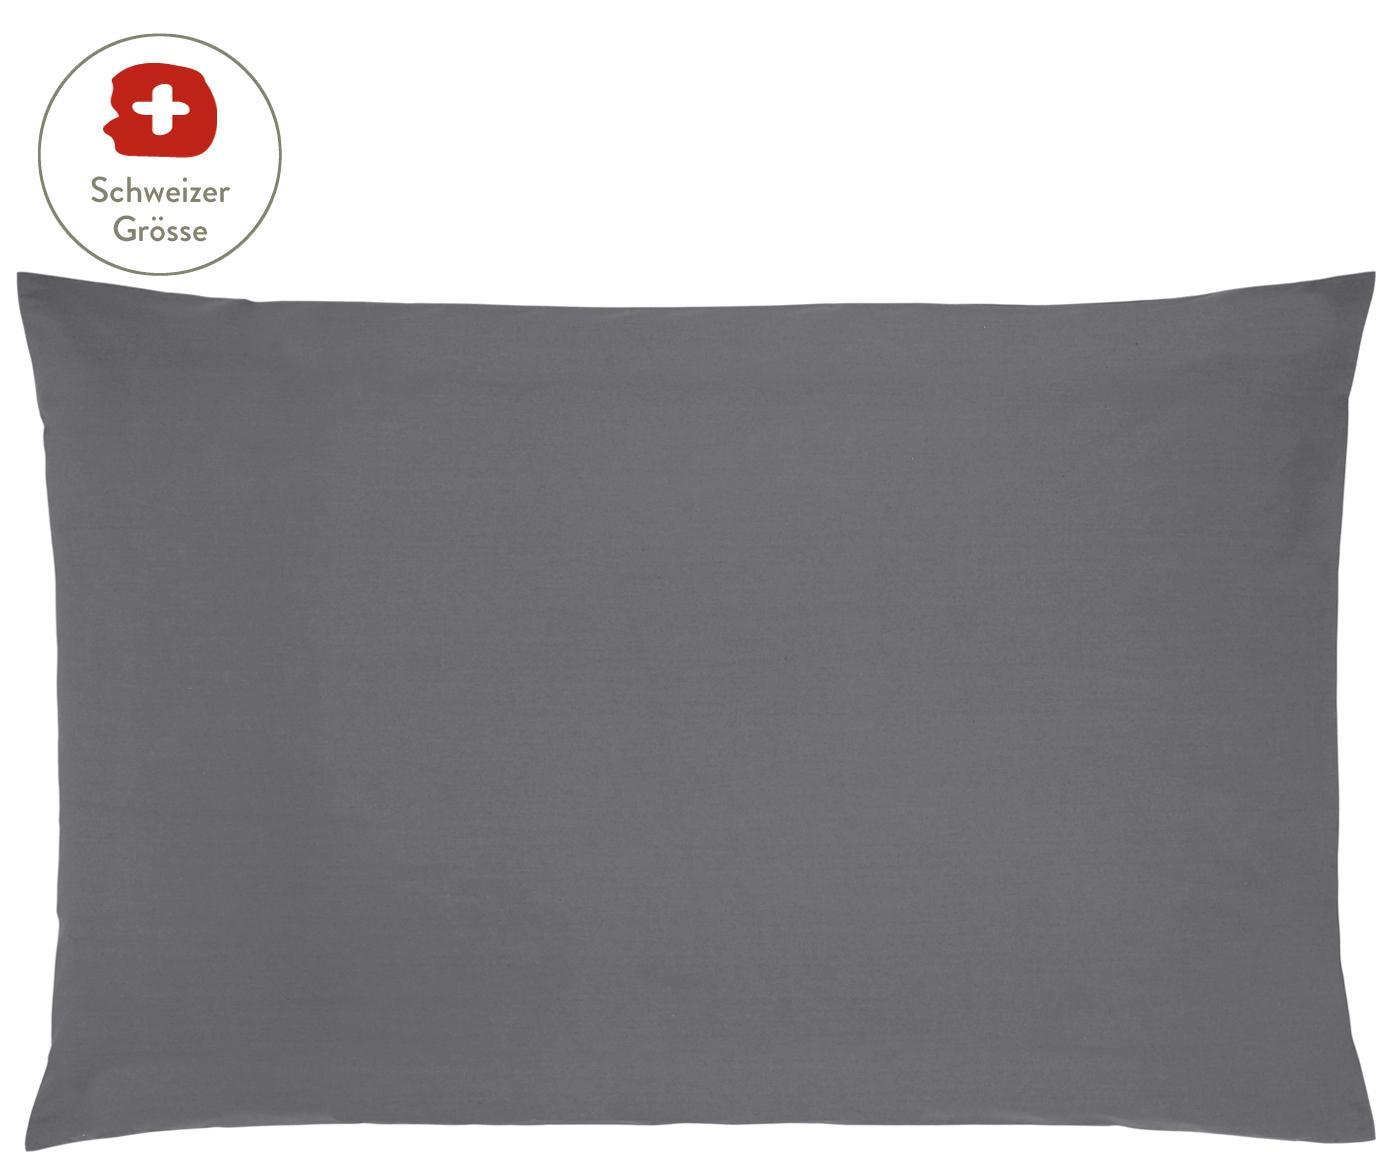 Baumwollperkal-Kissenbezug Elsie in Dunkelgrau, Webart: Perkal Fadendichte 200 TC, Dunkelgrau, 65 x 100 cm